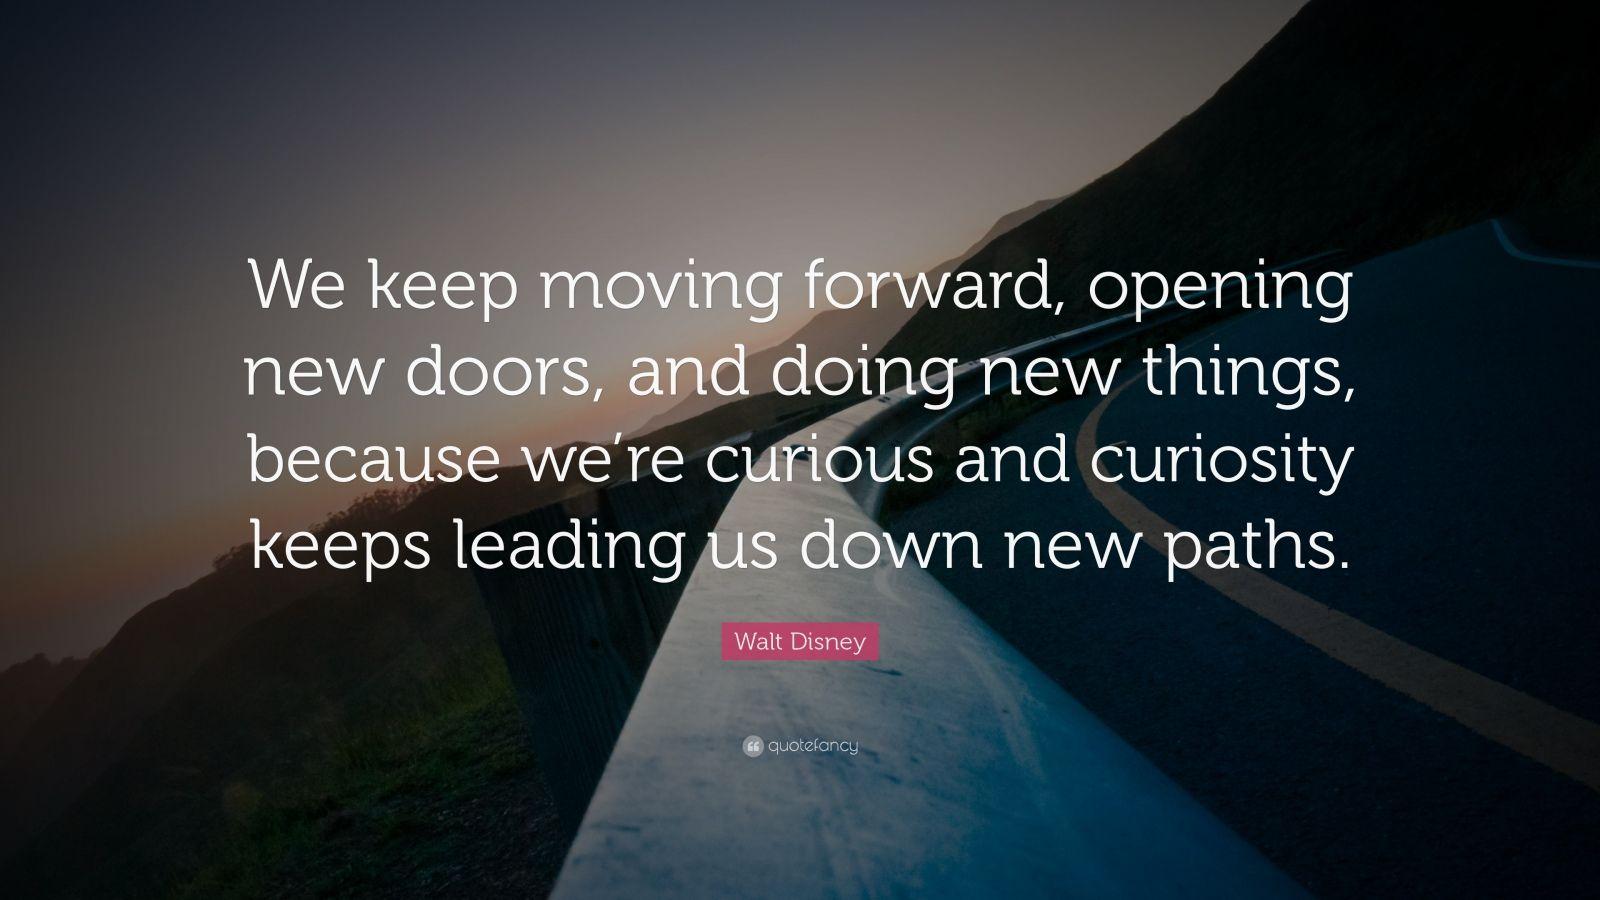 We Keep Moving Forward Walt Disney Quotes